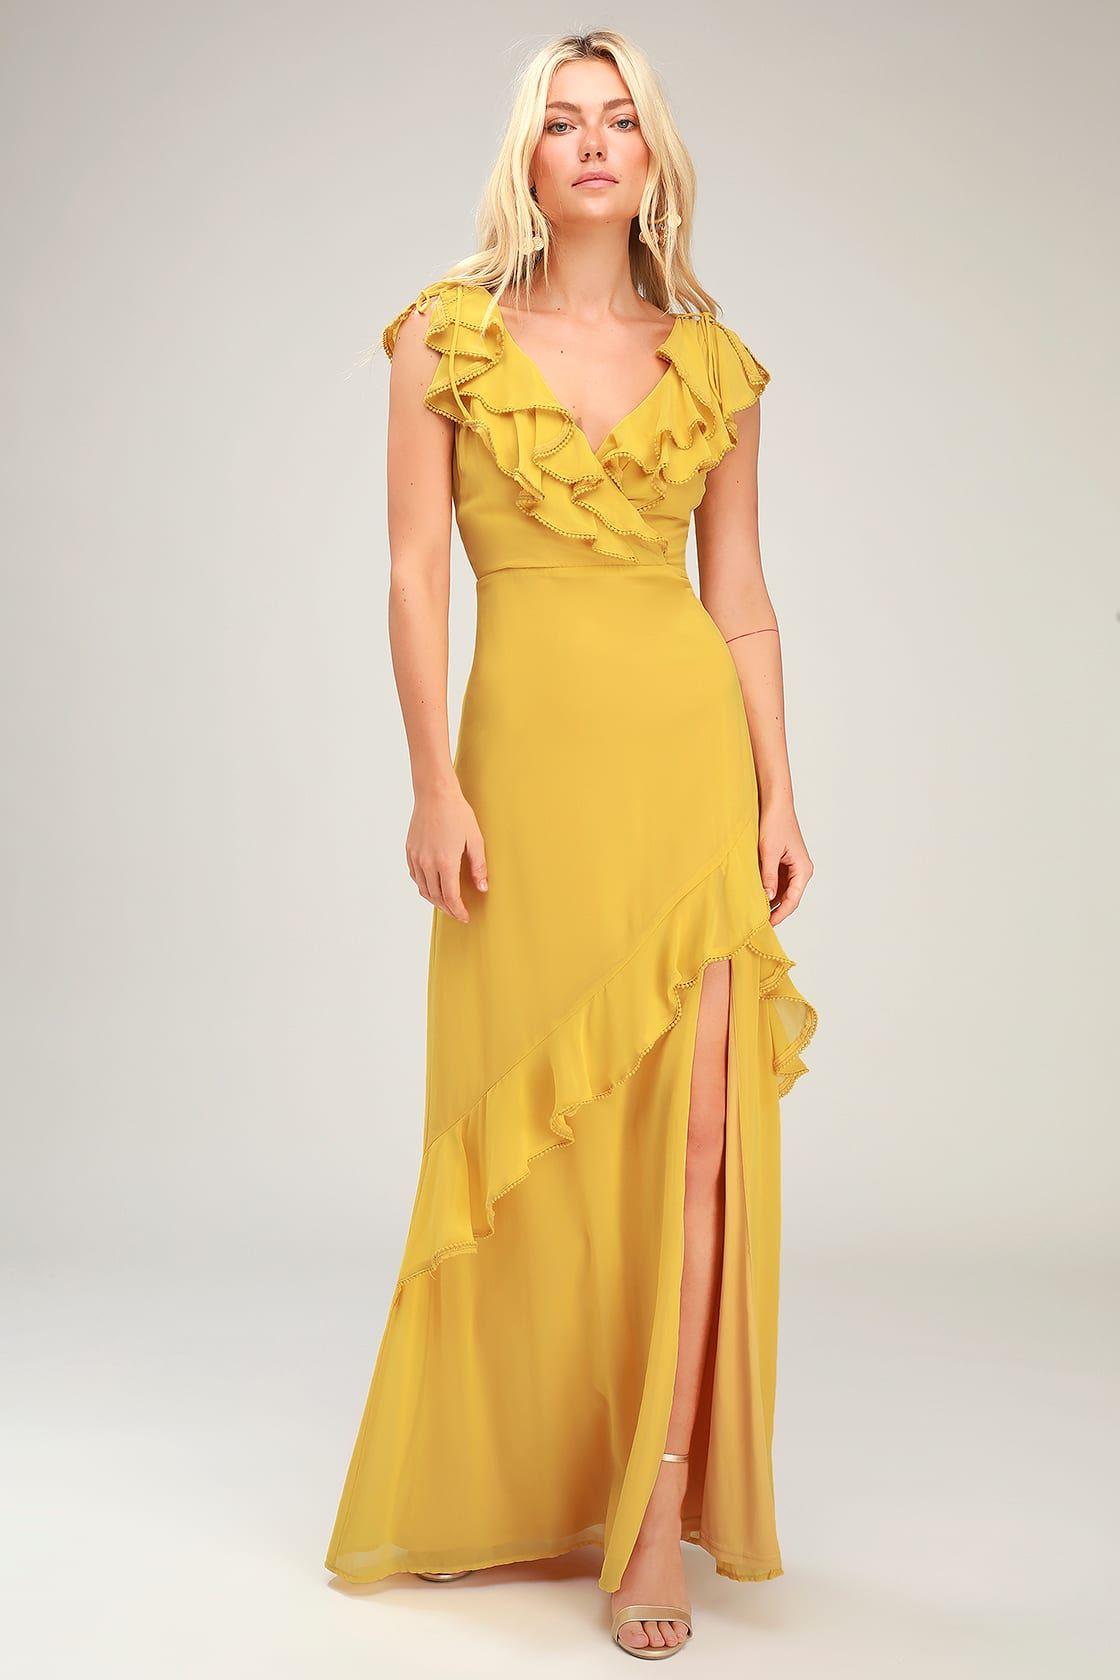 Love From Above Mustard Yellow Ruffled Surplice Maxi Dress Yellow Maxi Dress Cocktail Dress Yellow Womens Yellow Dress [ 1680 x 1120 Pixel ]